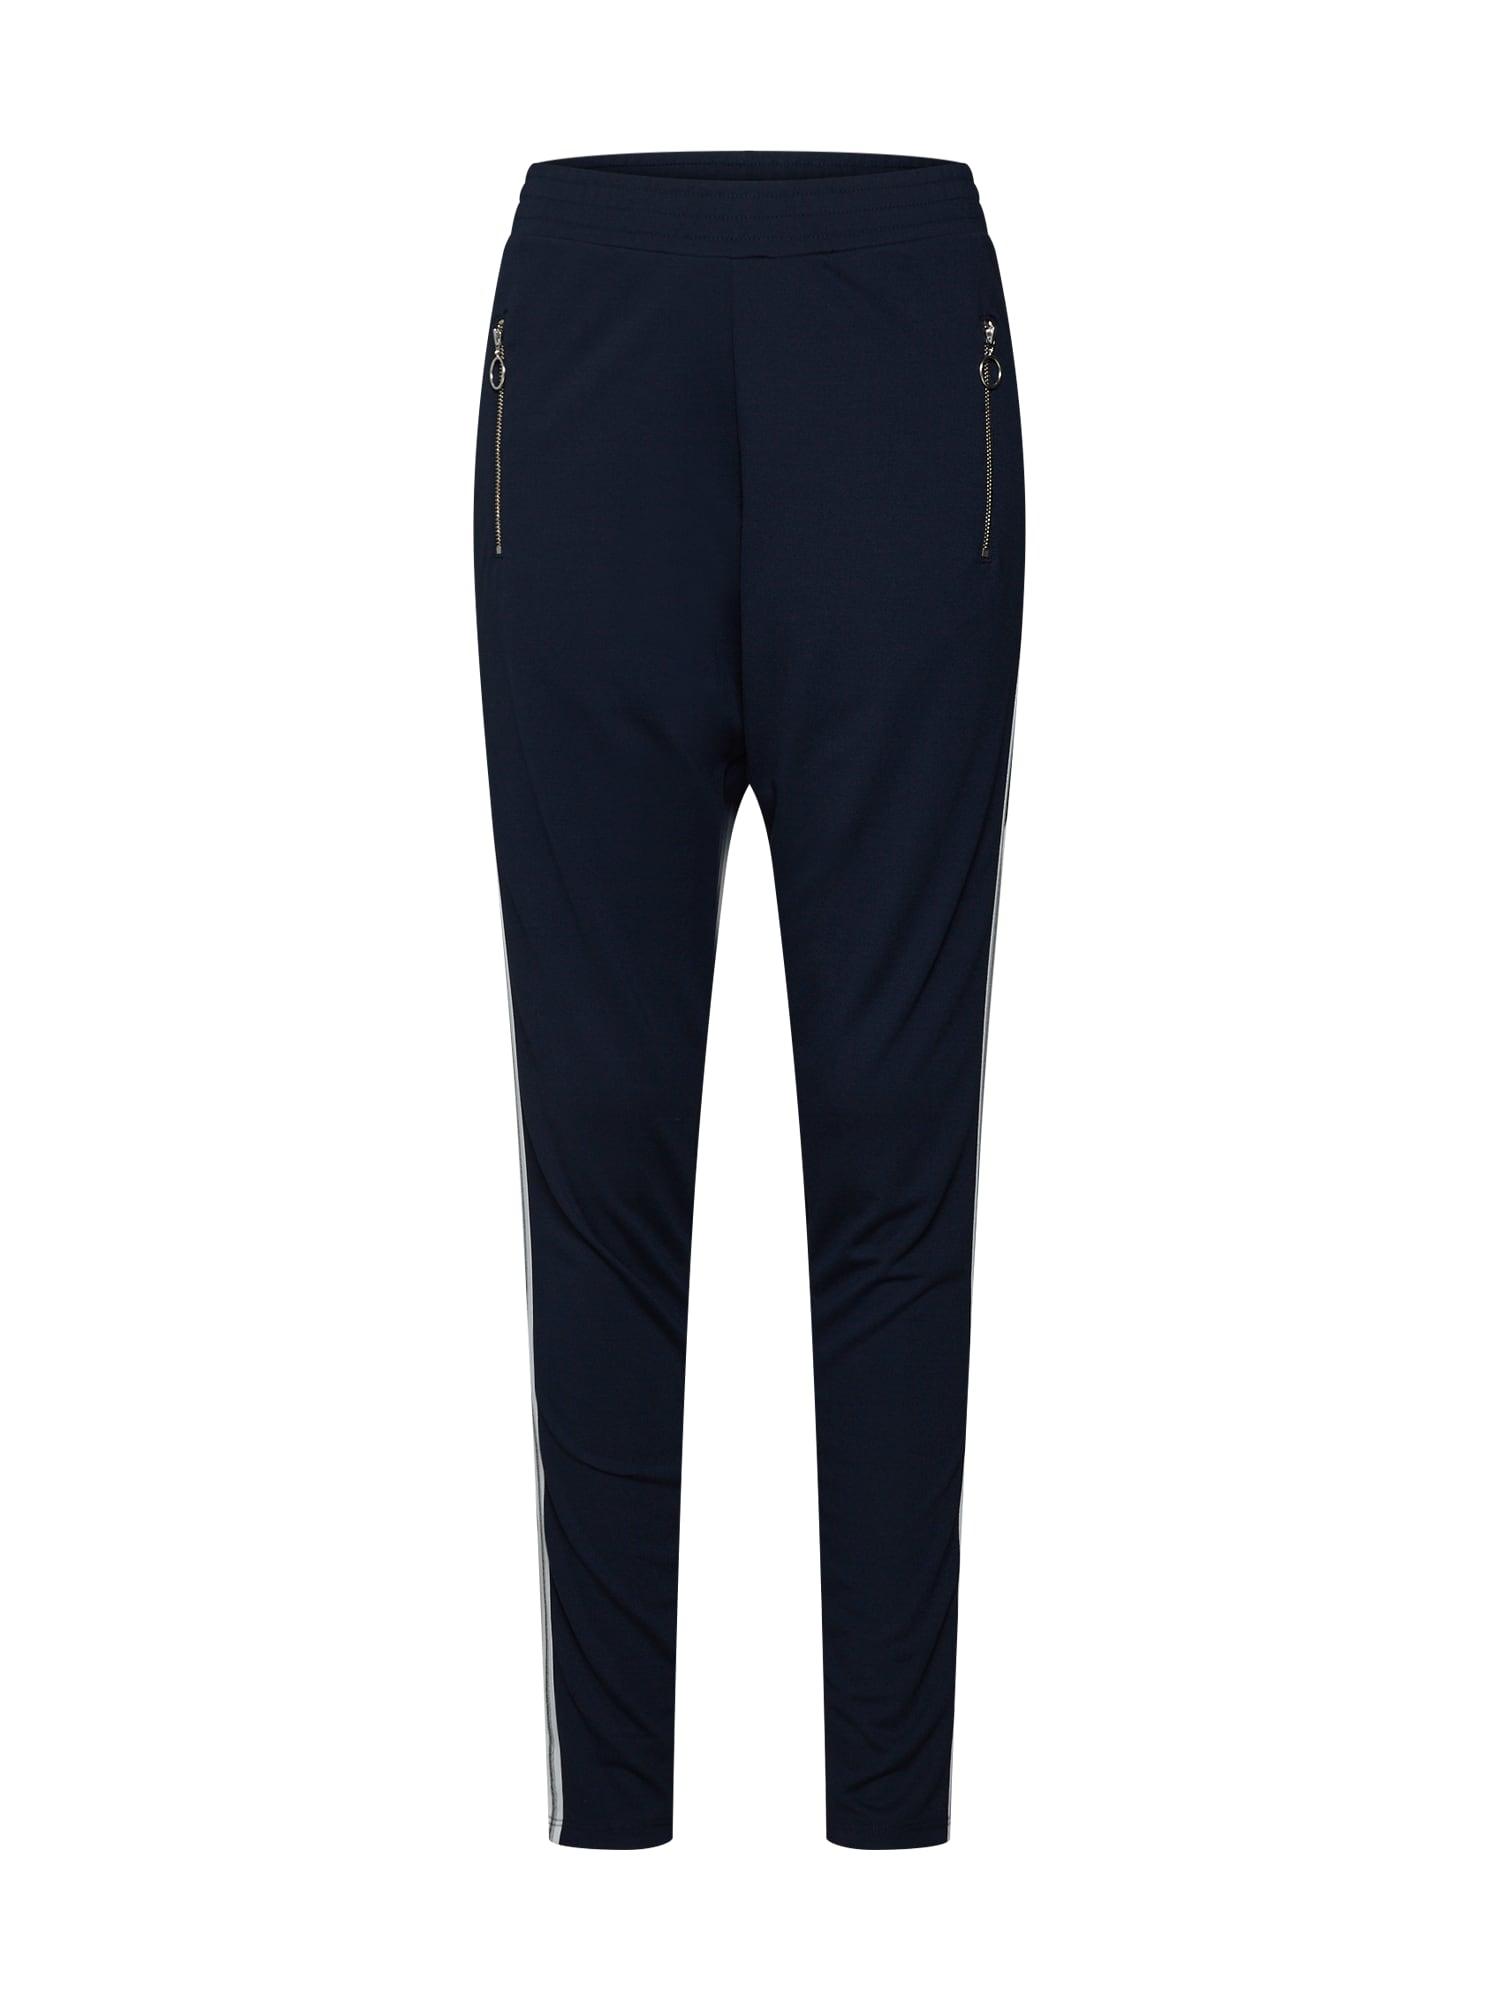 Kalhoty Geggo Pants marine modrá Kaffe